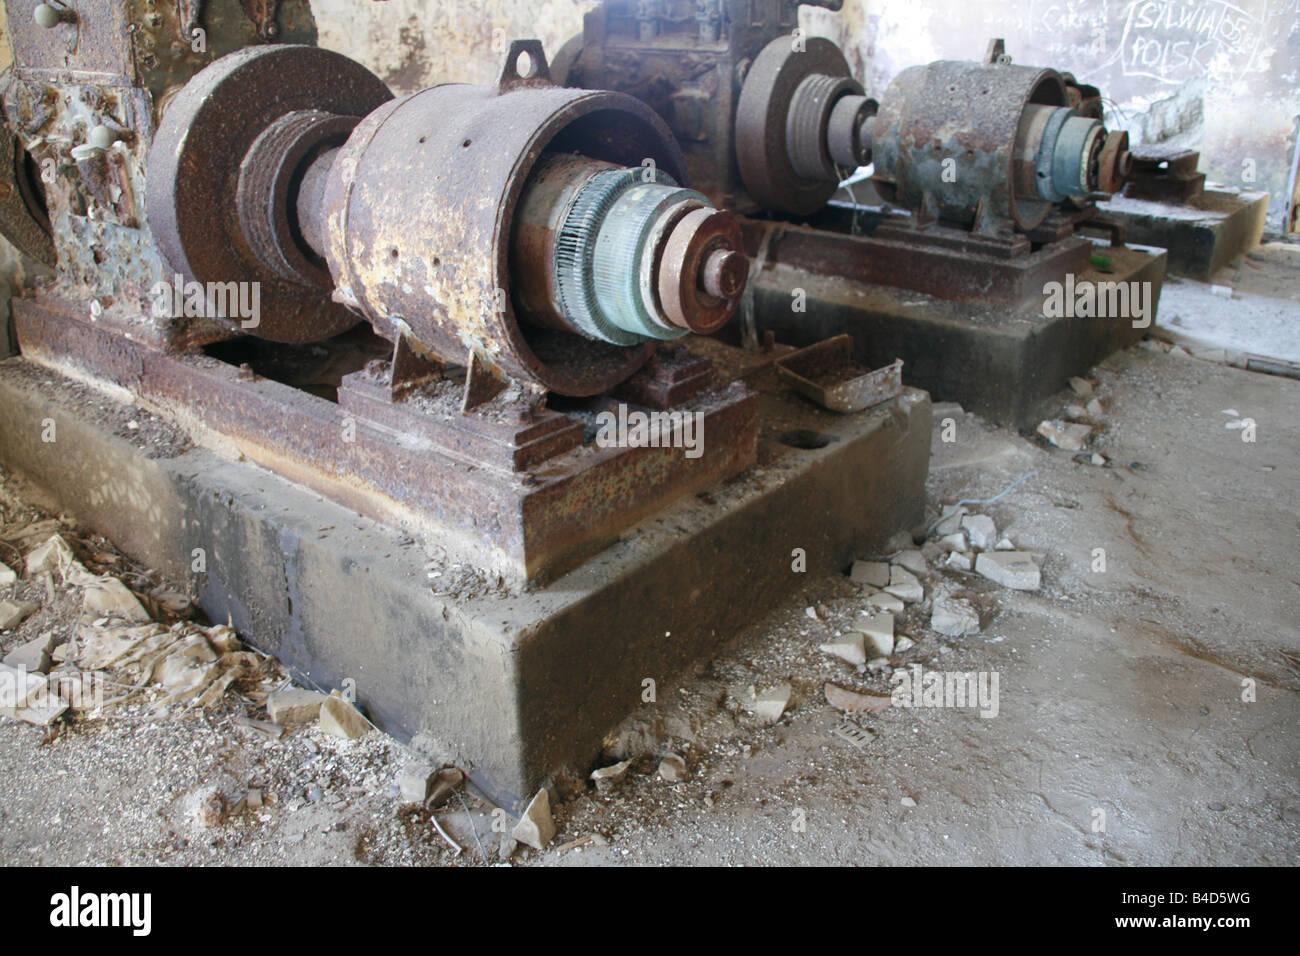 old damaged machinery in derelict manufacturing workshop